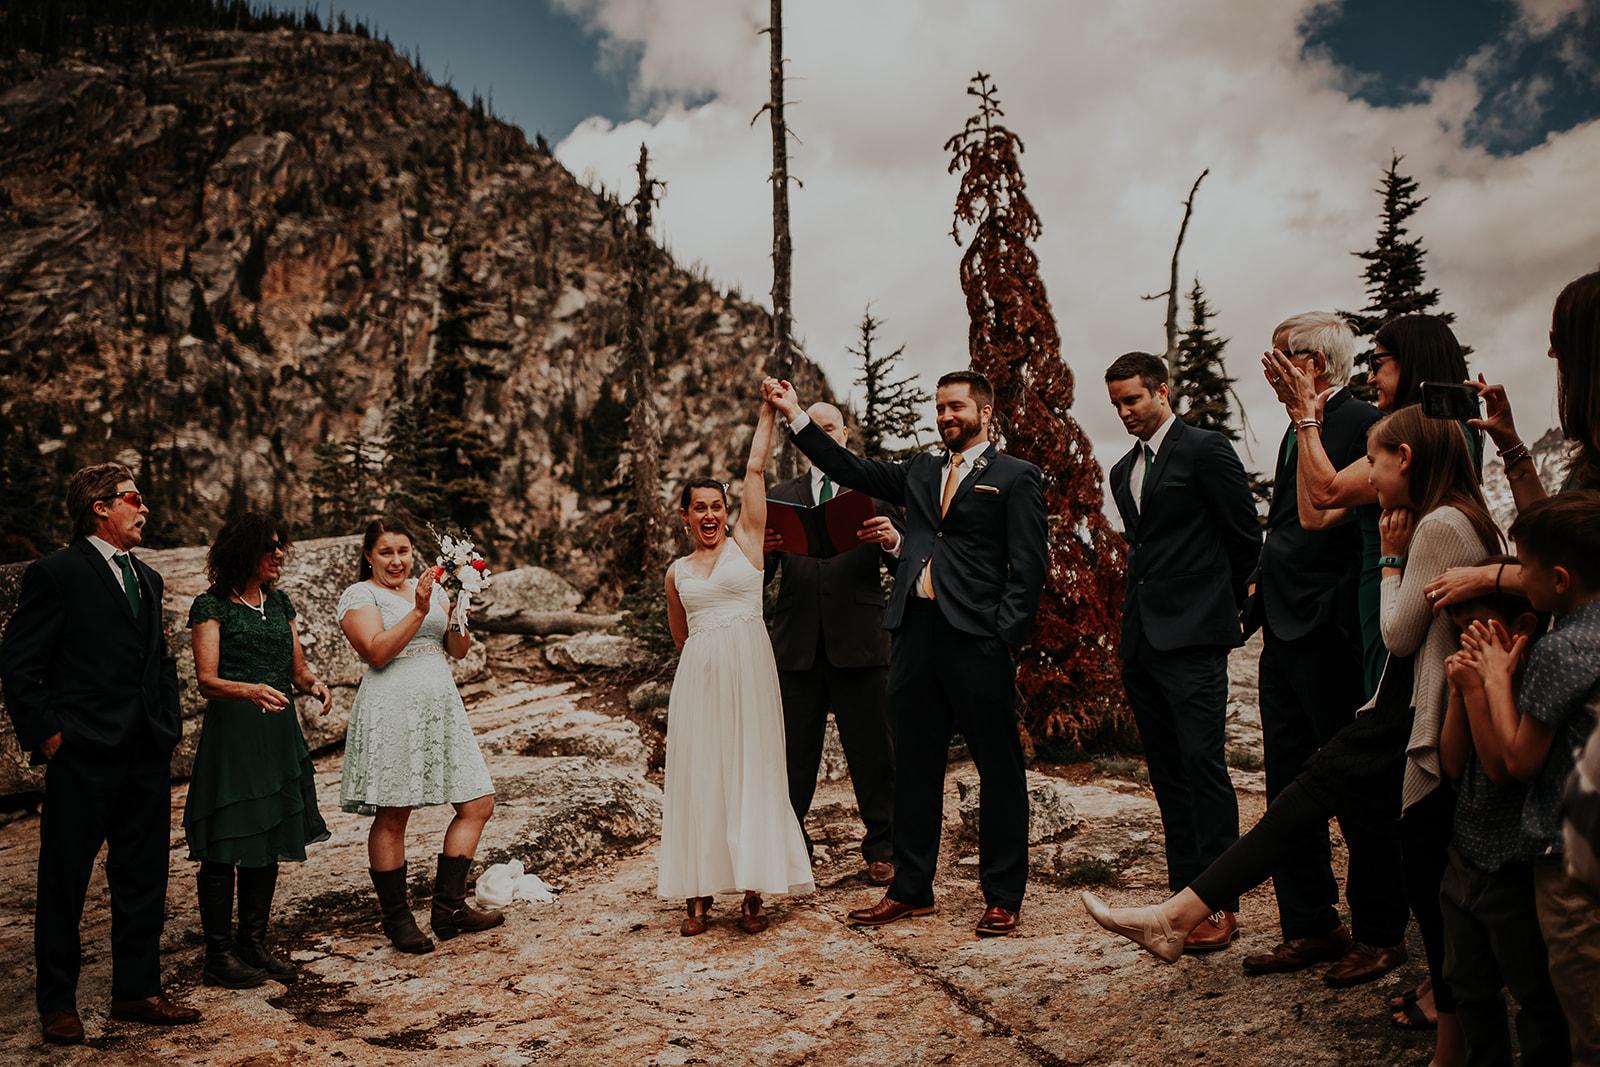 winthrop-wedding-photographer-megan-gallagher-photography (19).jpg